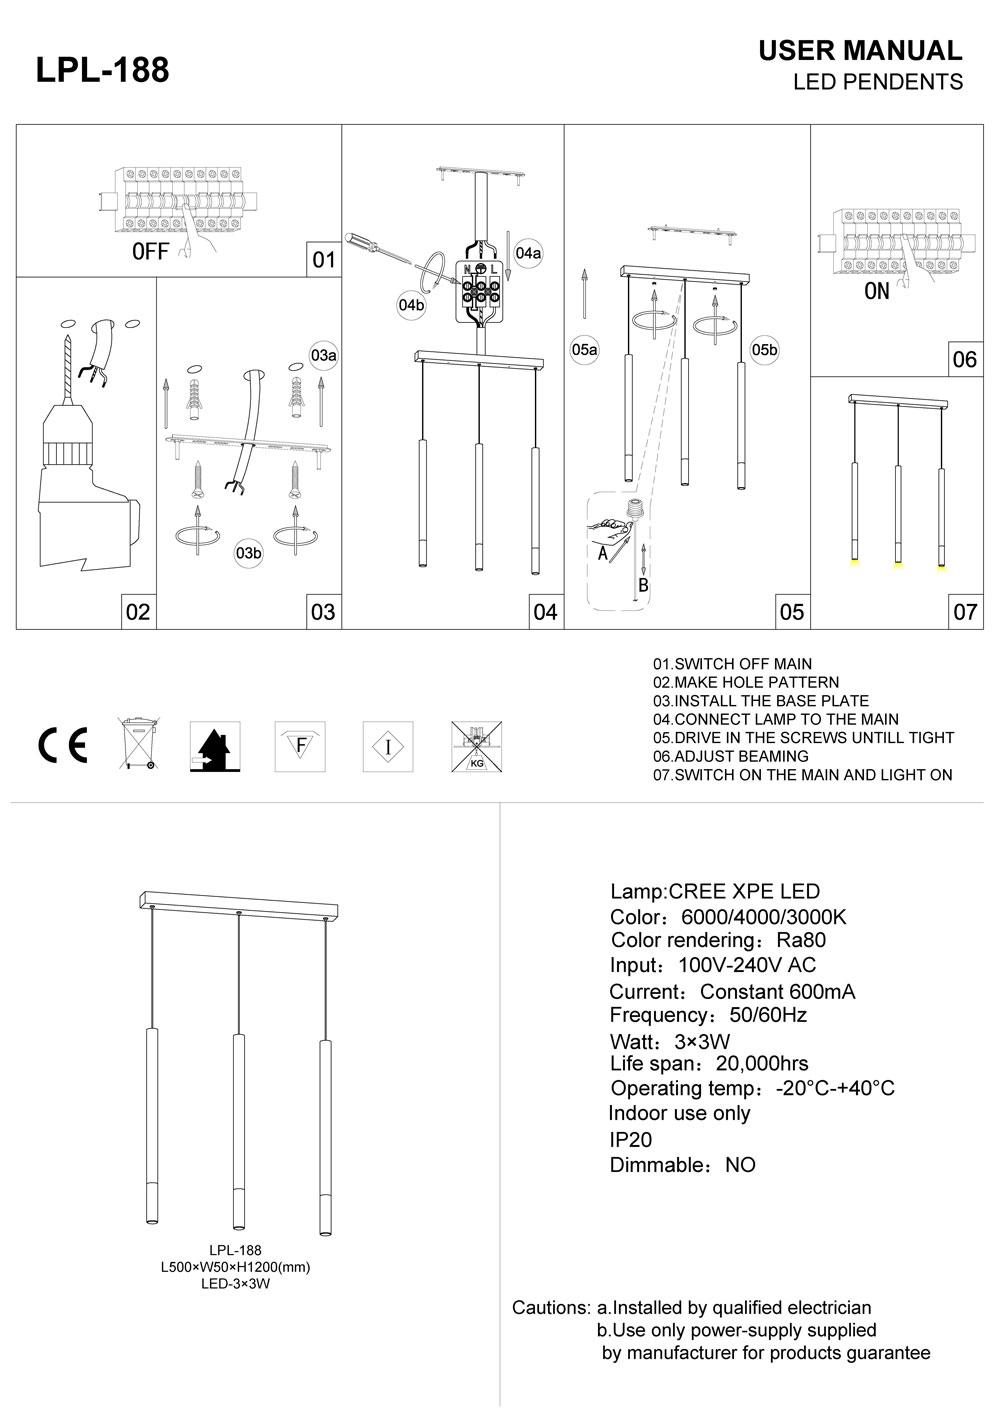 LED pendant light installation instructions